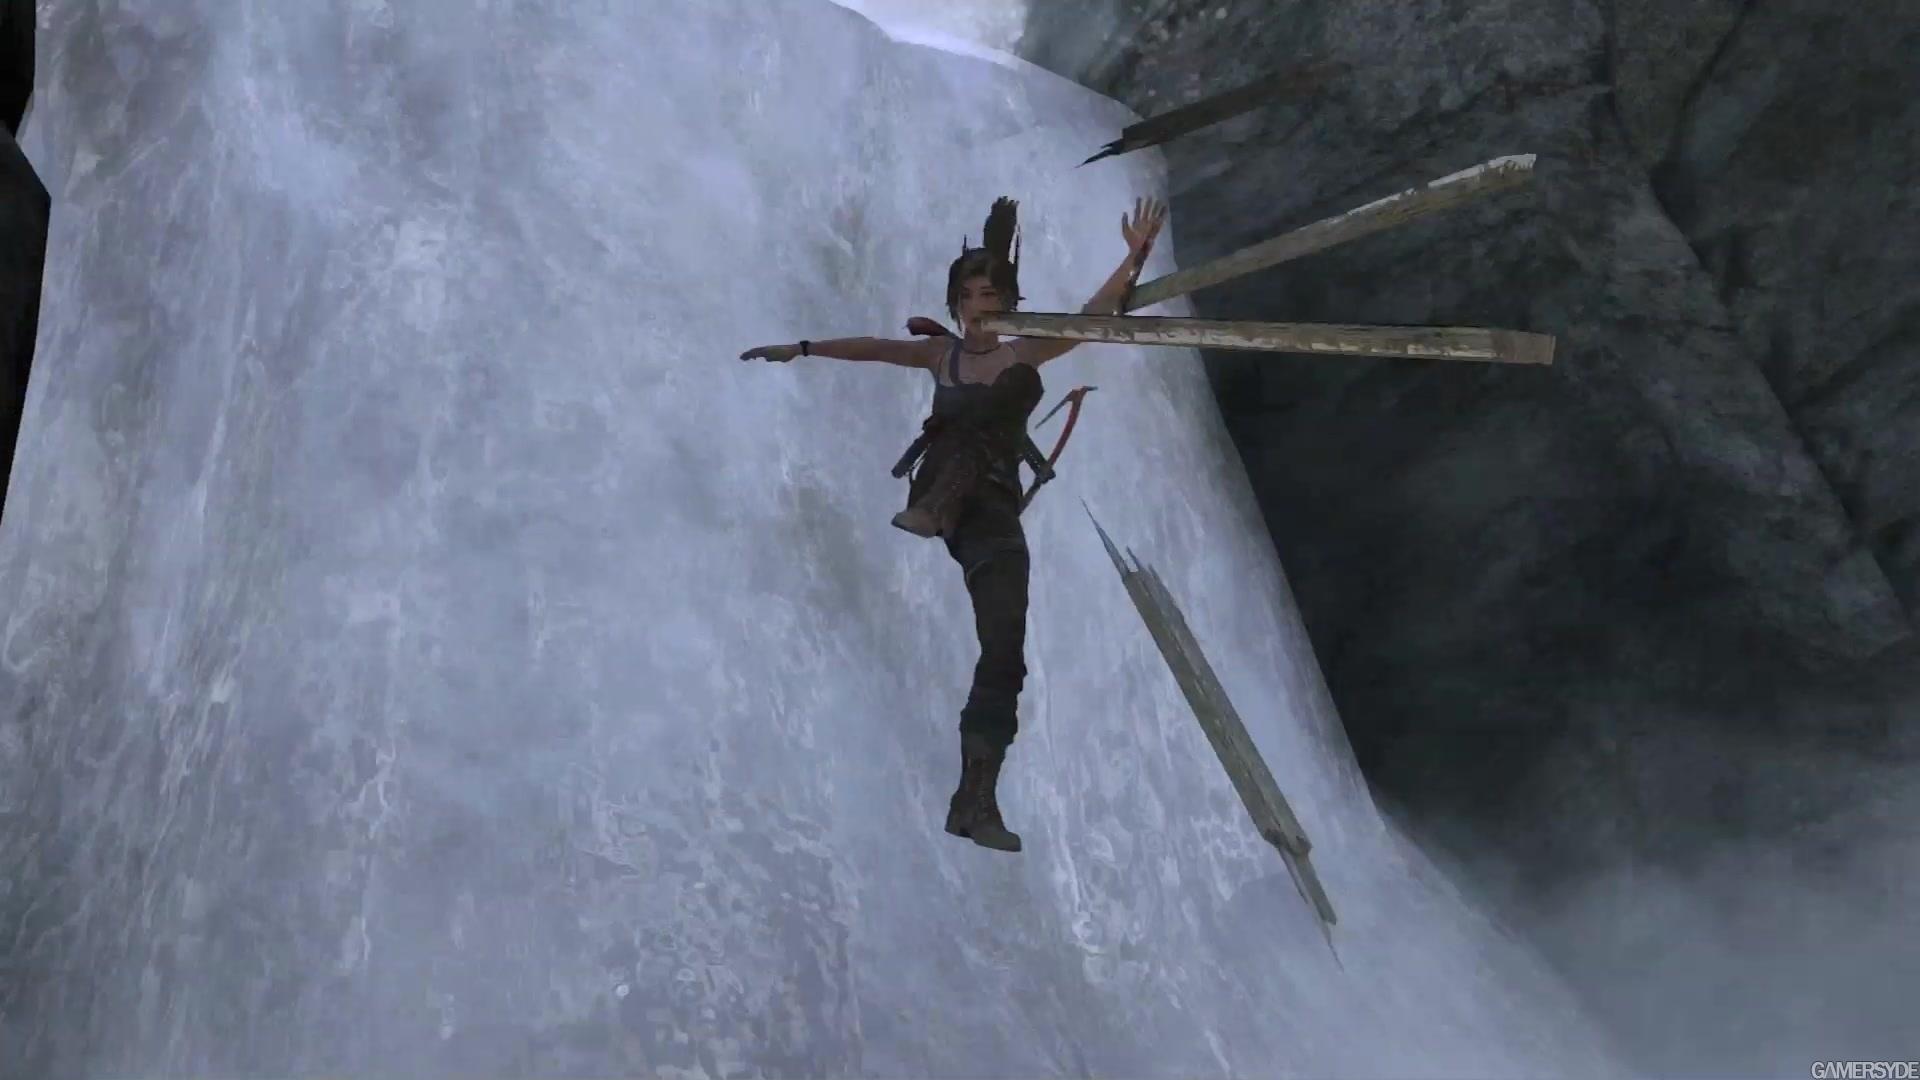 image tomb raider 24052 1912 0023 تصاویر جدیدی از عنوان Tomb Raider: Definitive Edition منتشر شد